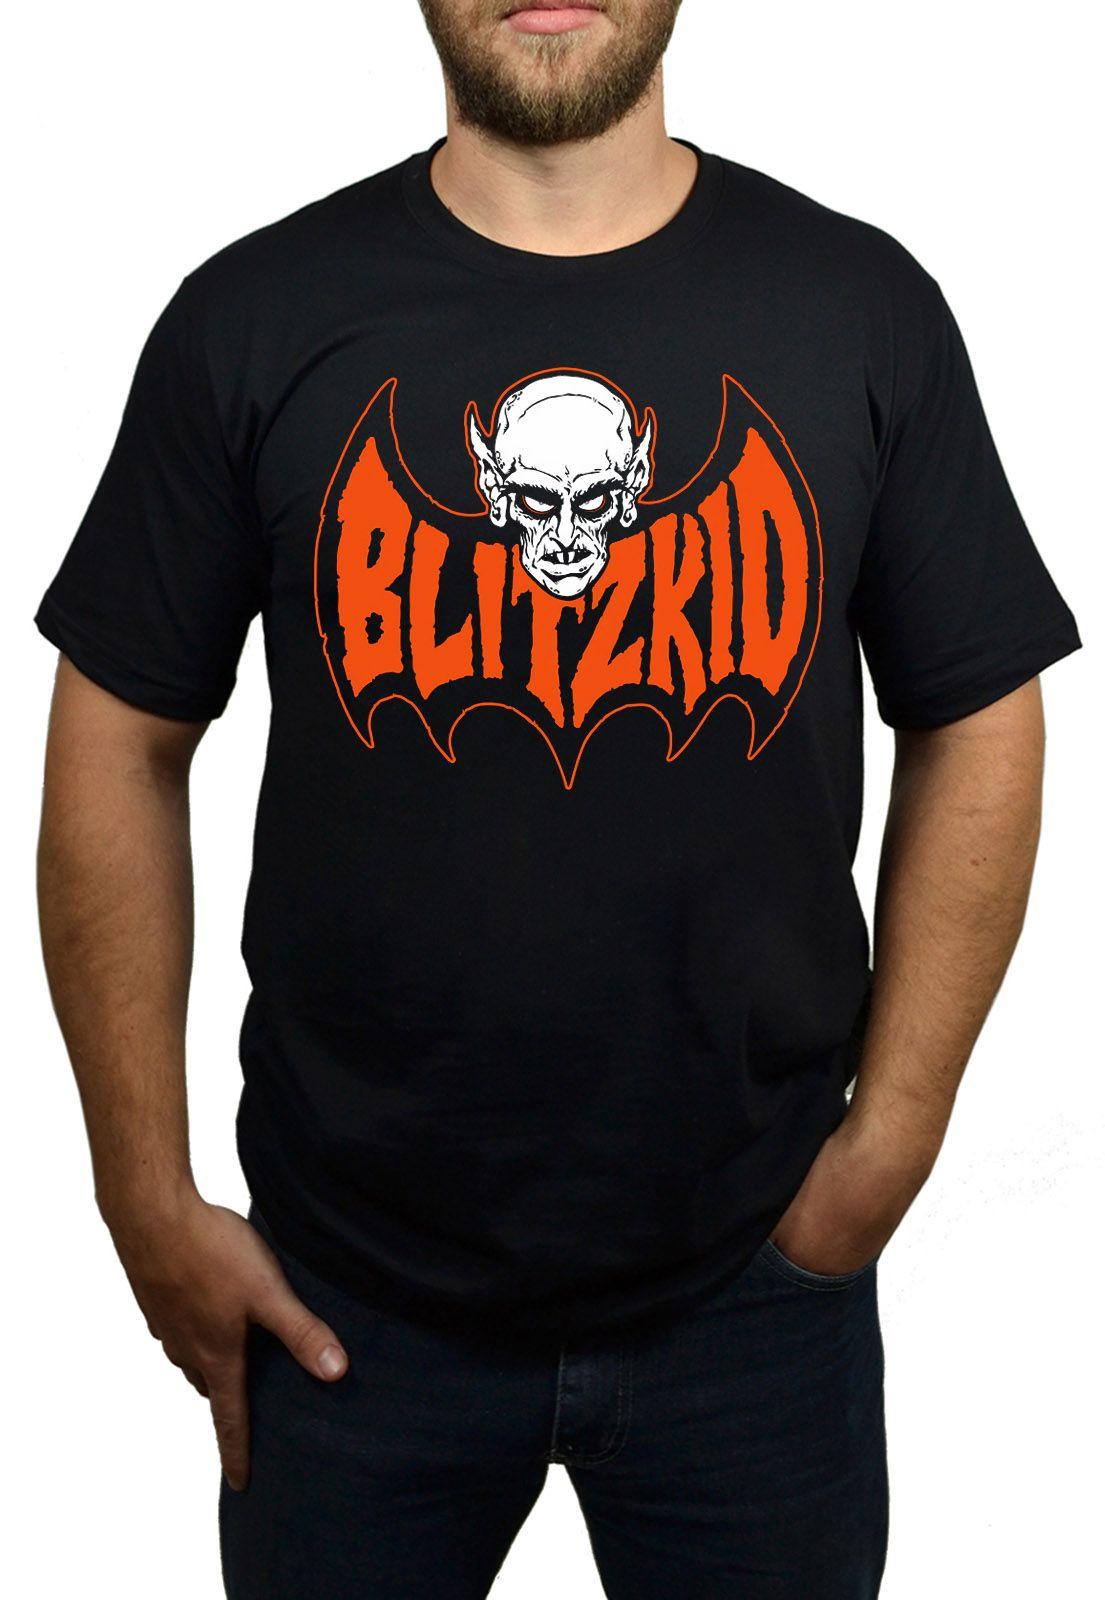 Camiseta Blitzkid Preta  - HShop